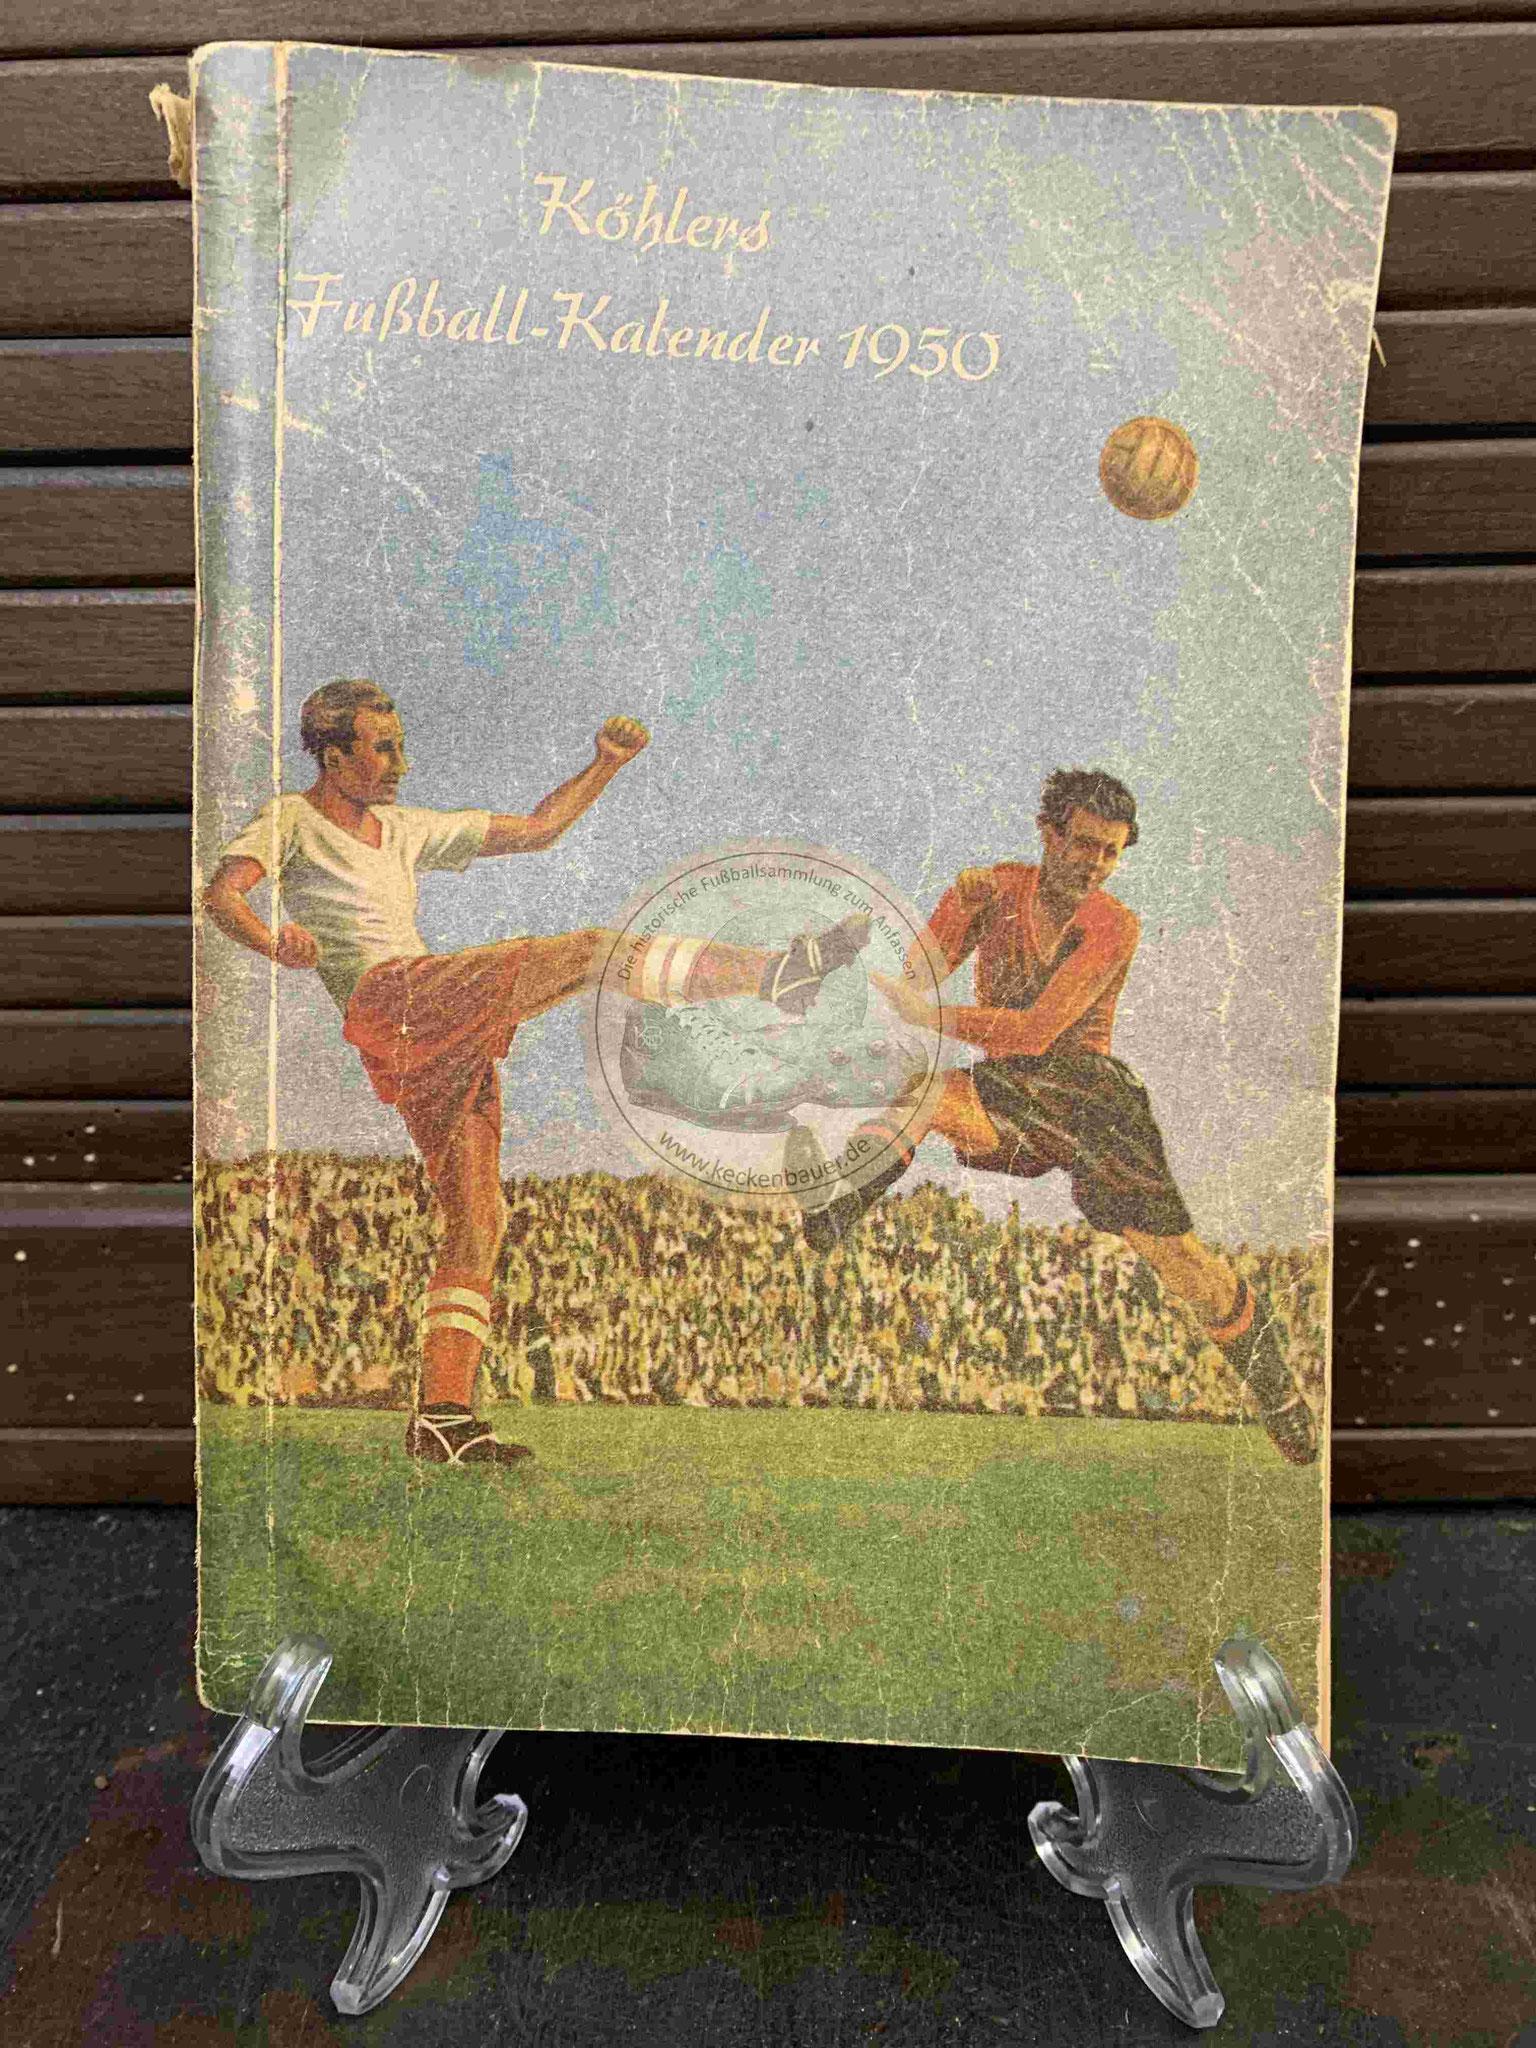 Köhlers Fußball-Kalender aus dem Jahr 1950